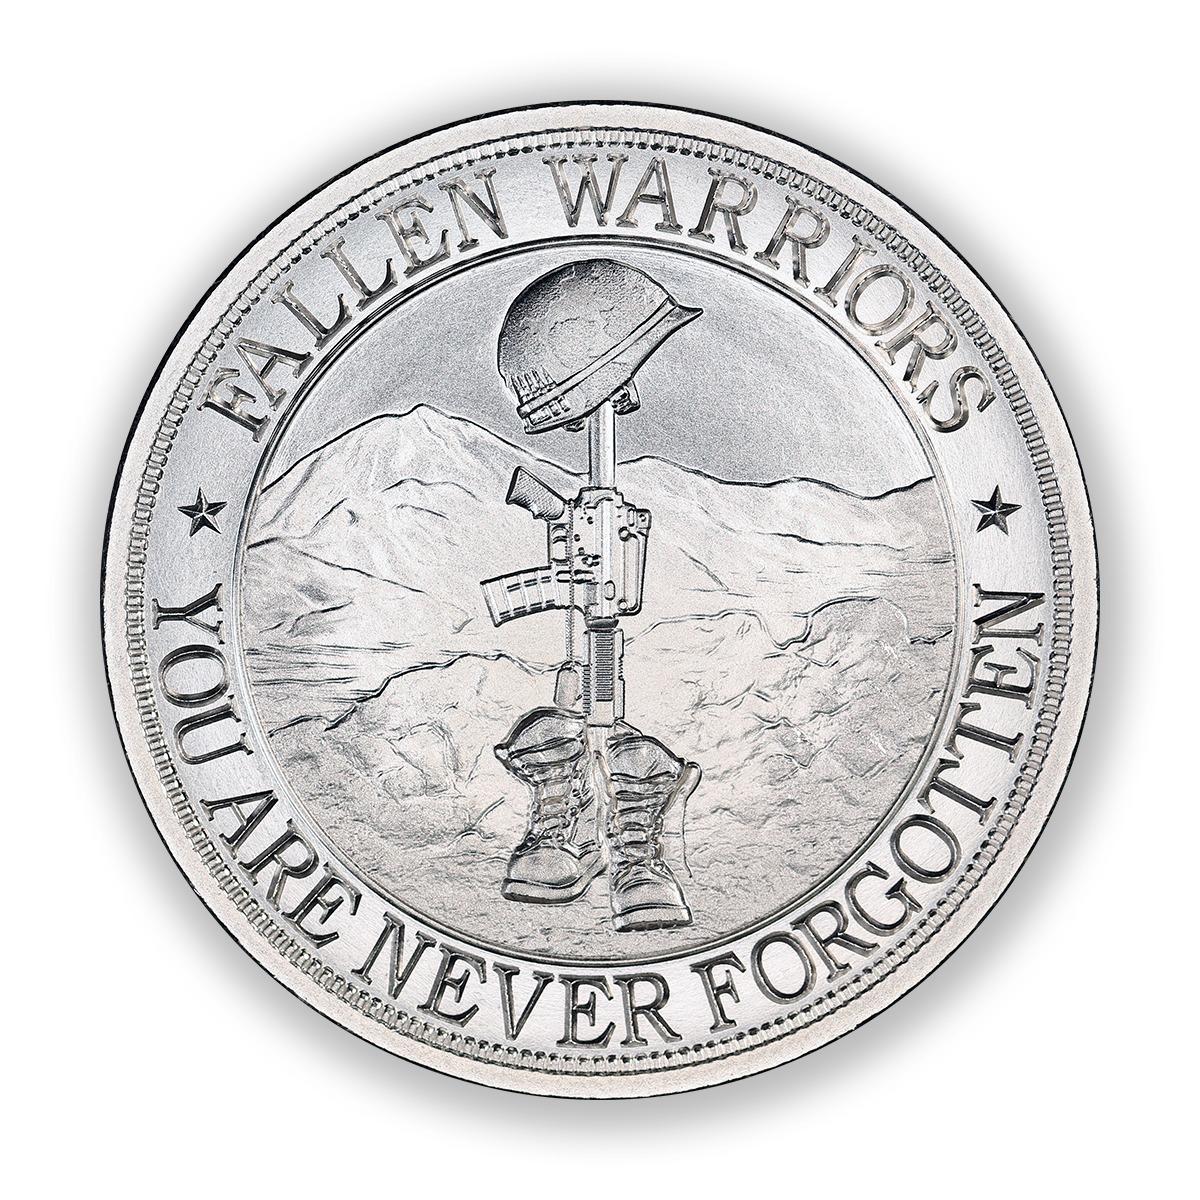 High Relief - Battlefield Cross Tribute - 2ozt 50mm .999 Fine Silver - 50mm Diameter - BU - Limited Mintage: 500